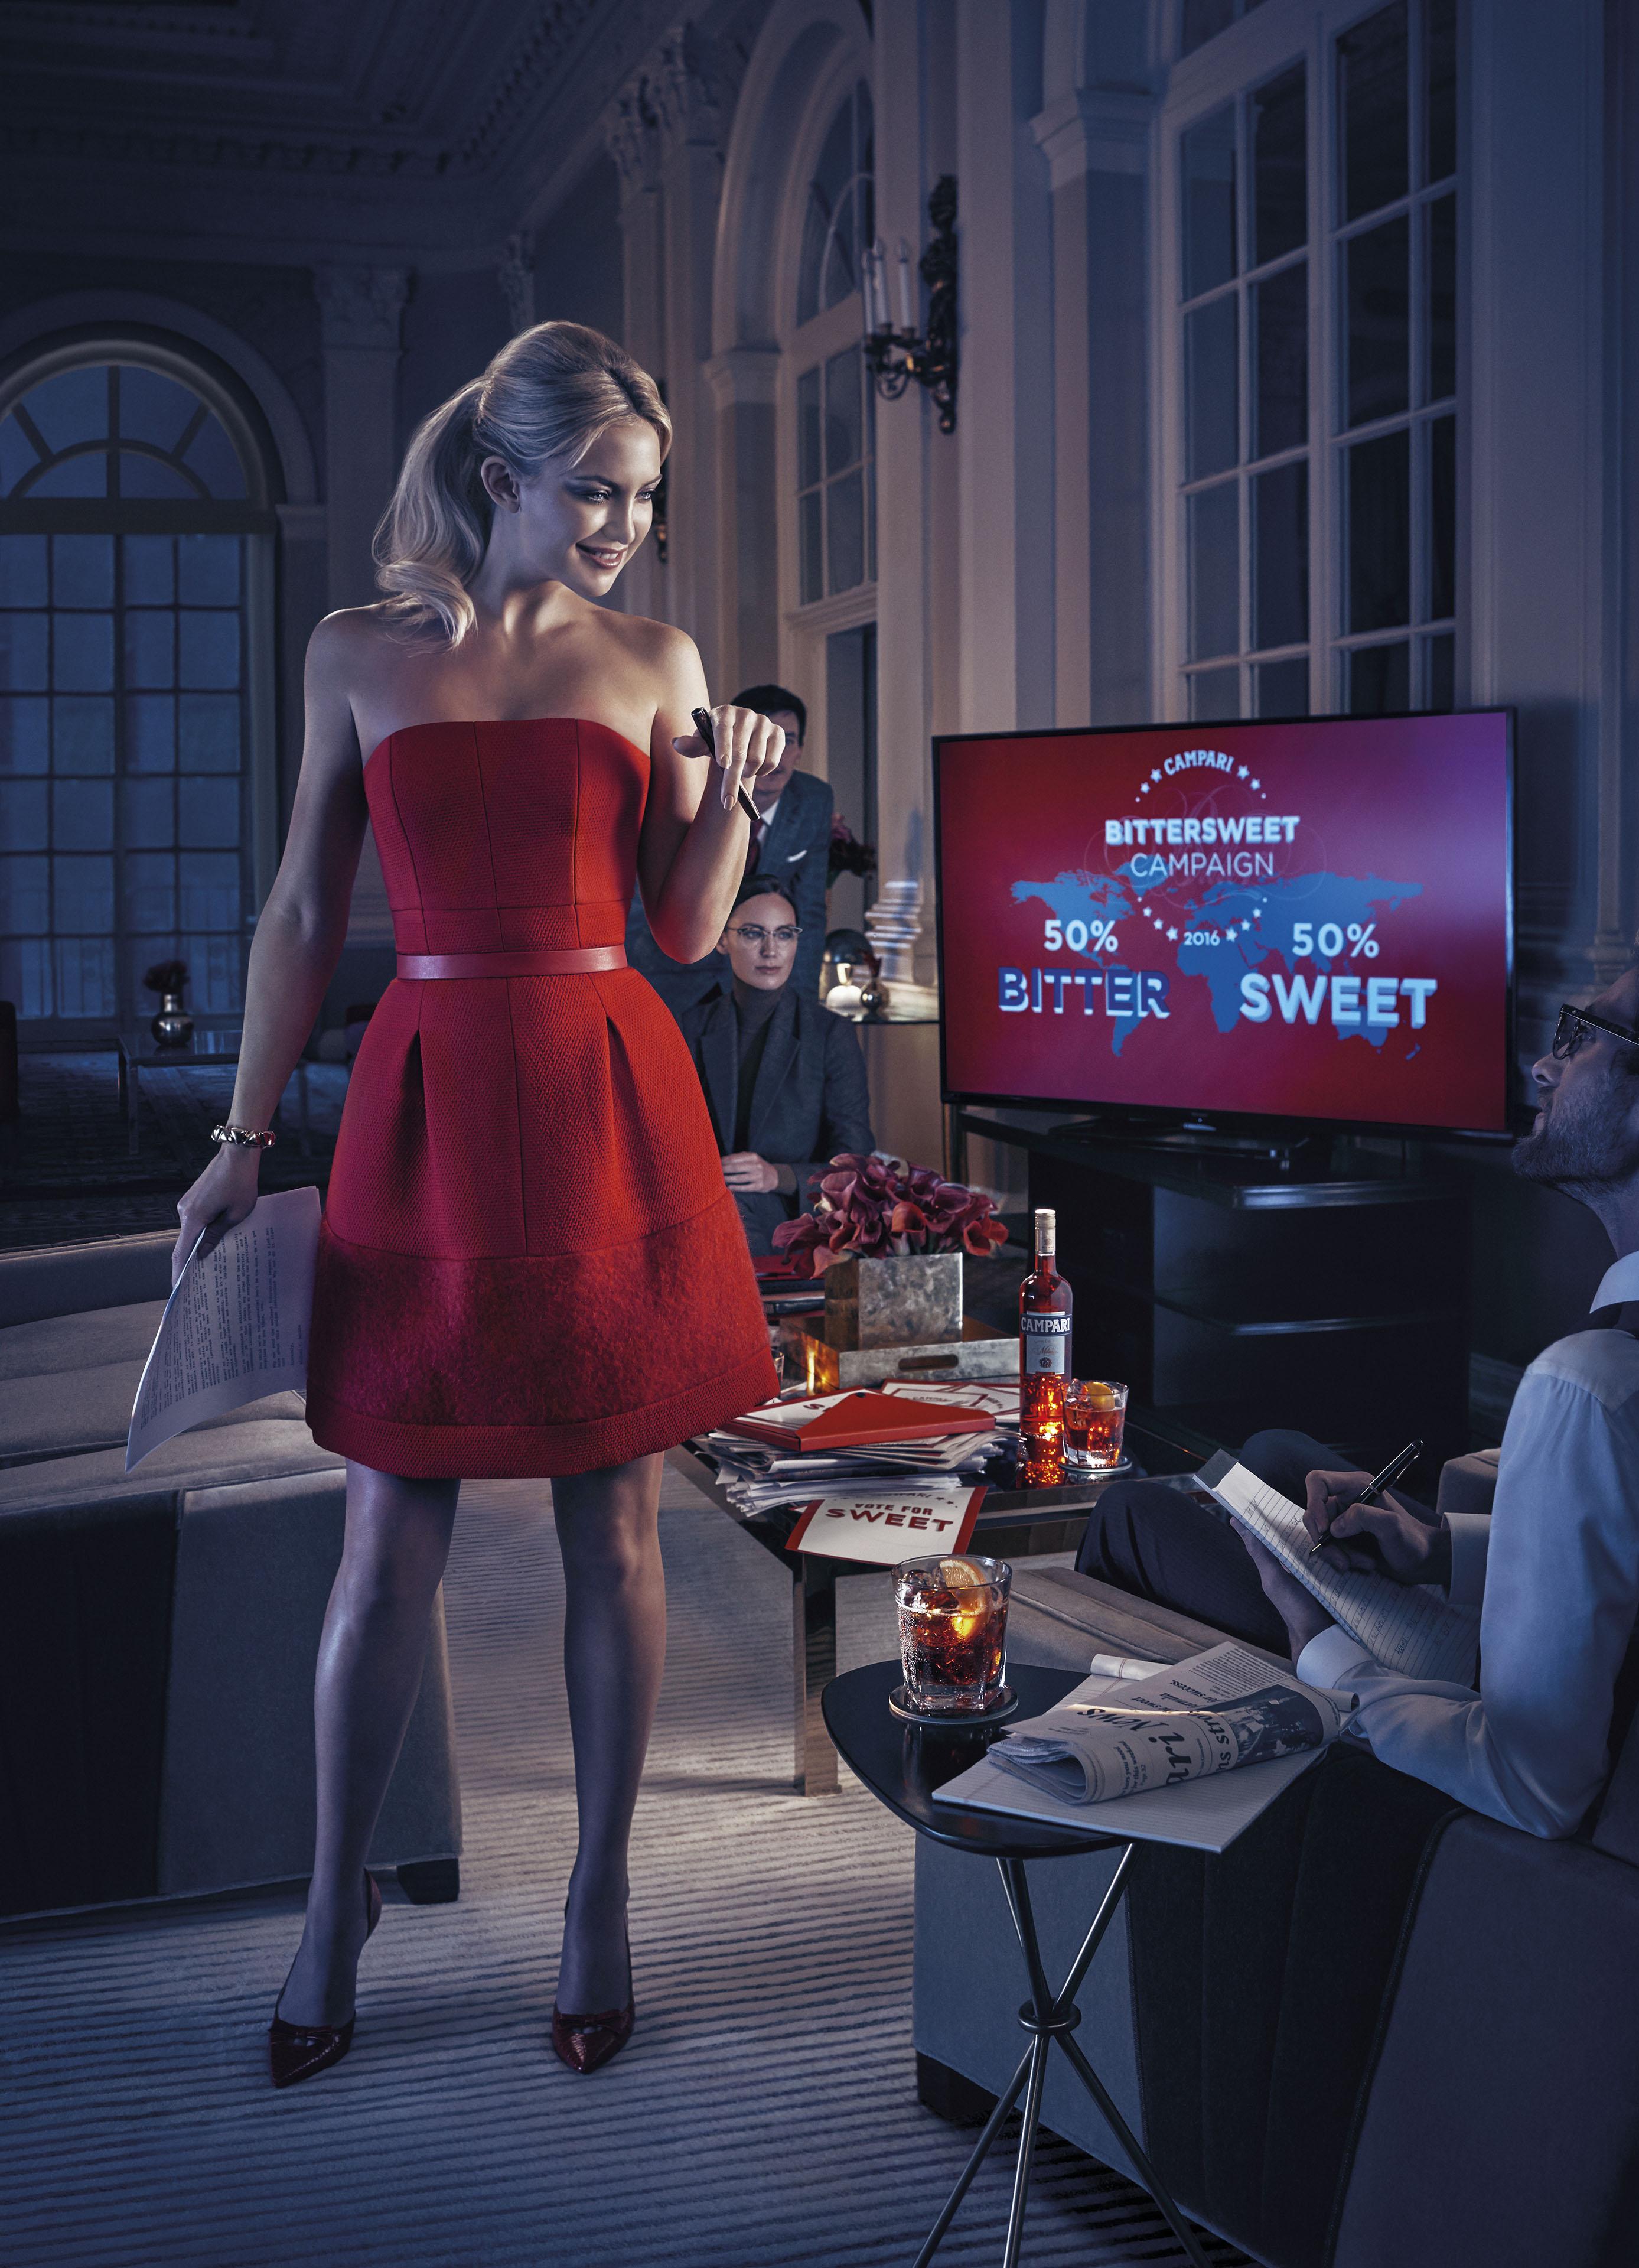 "Campari Calendar 2016 ""Bittersweet Campaign"" feat Kate Hudson | Michelangelo di Battista | Campari | Numerique Retouch Photo Retouching Studio"